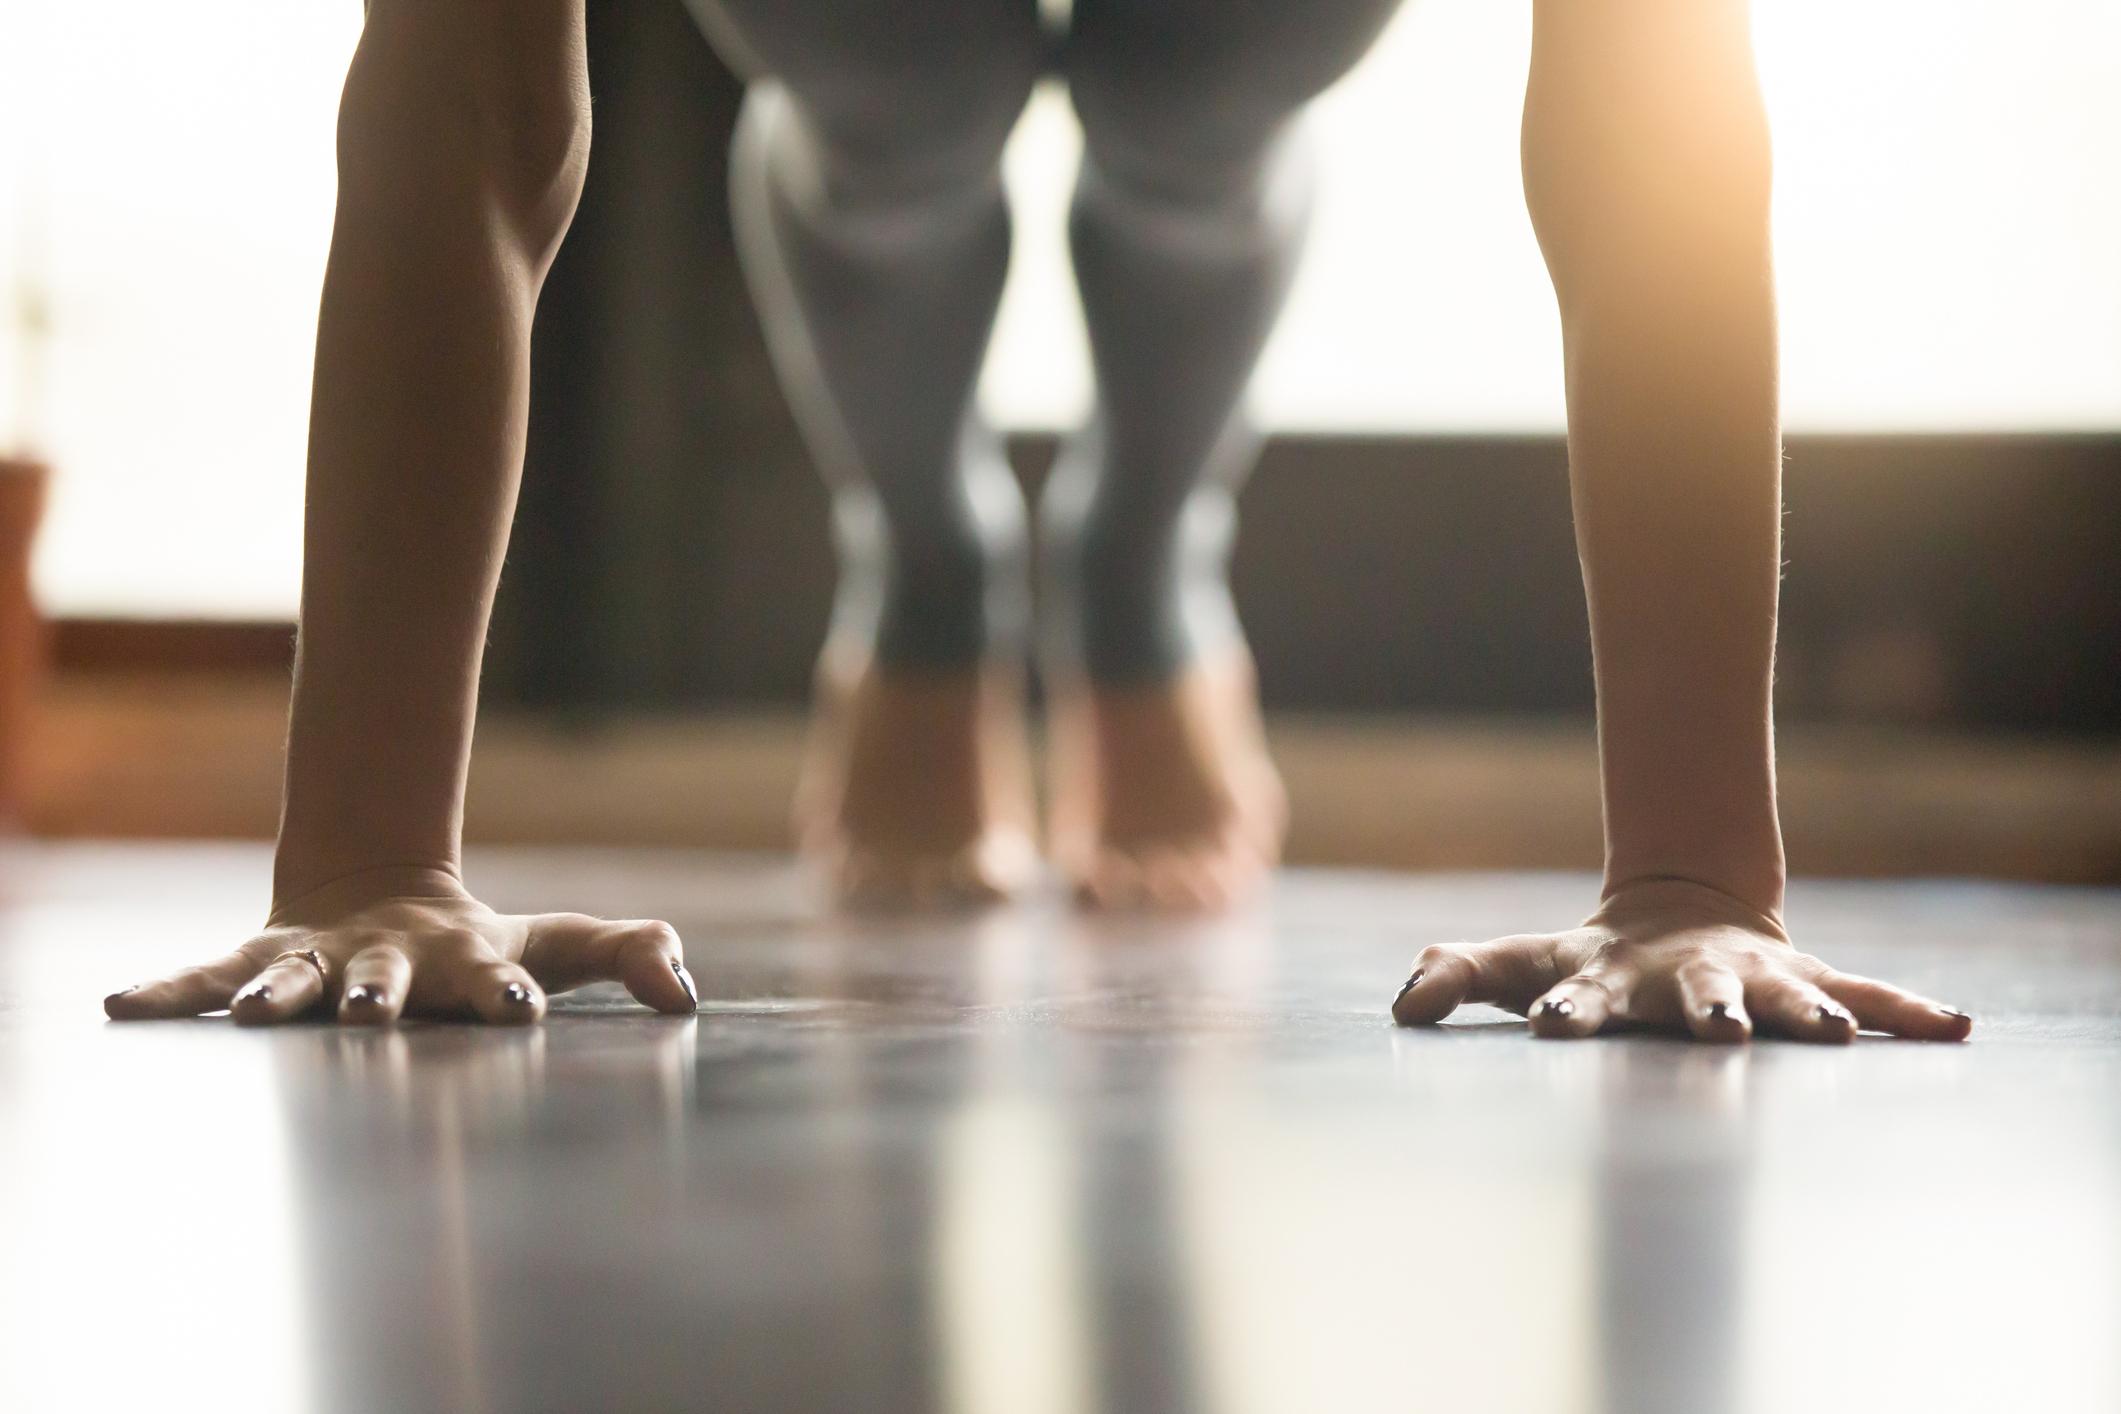 Maximize strength, flexibility, endurance, power